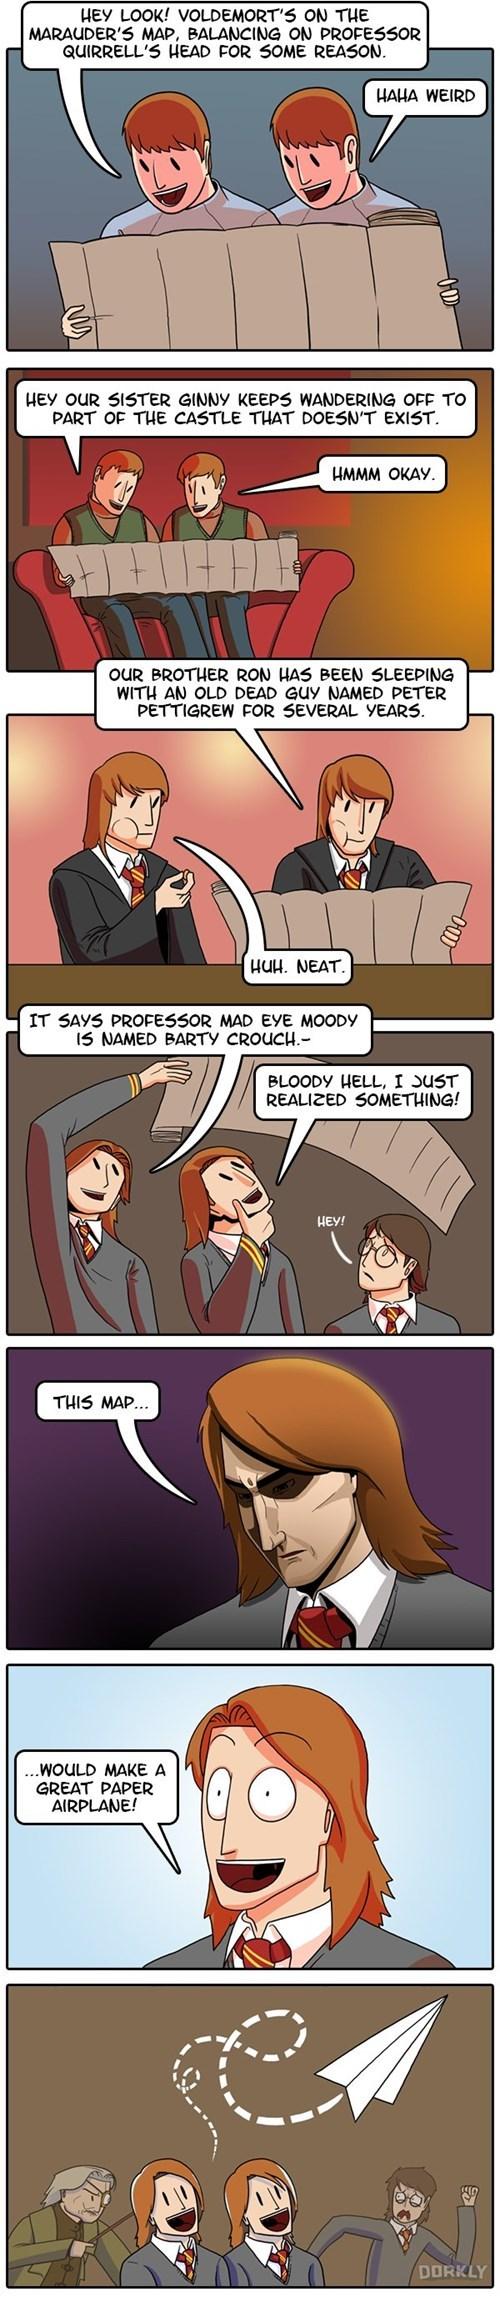 harry potter memes weasley twins marauders map web comic